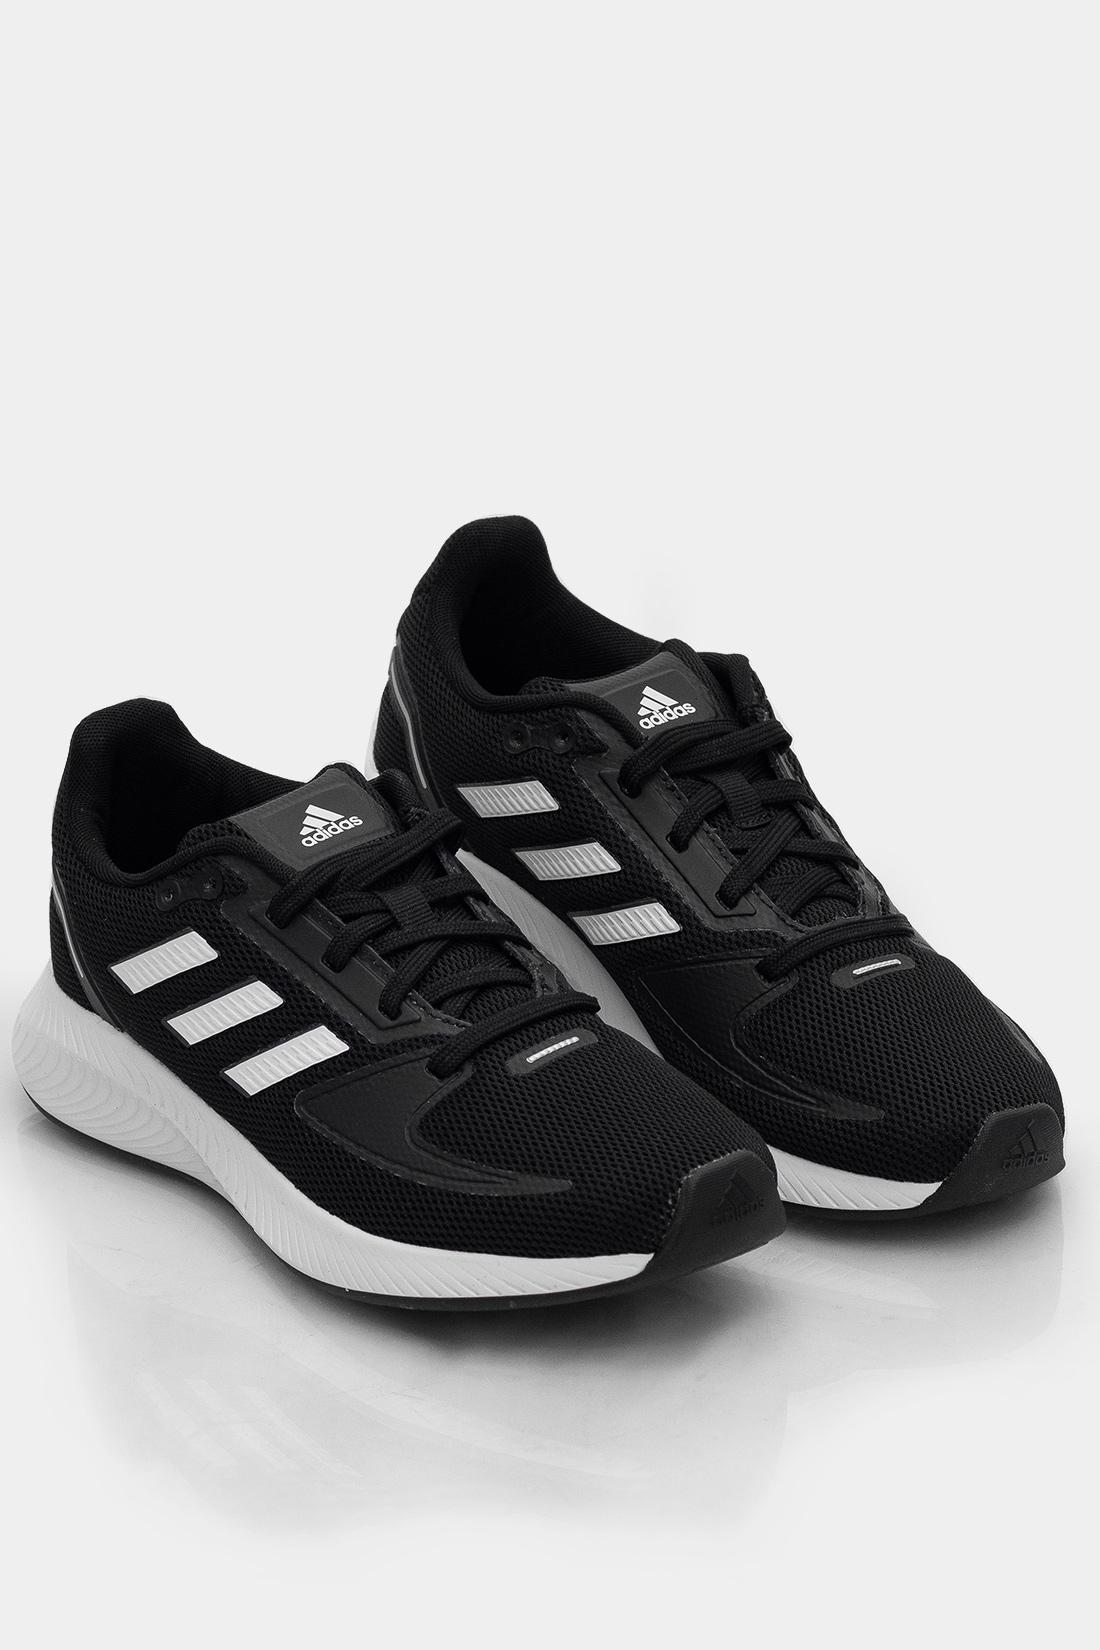 Tenis Running Adidas Runfalcon 20